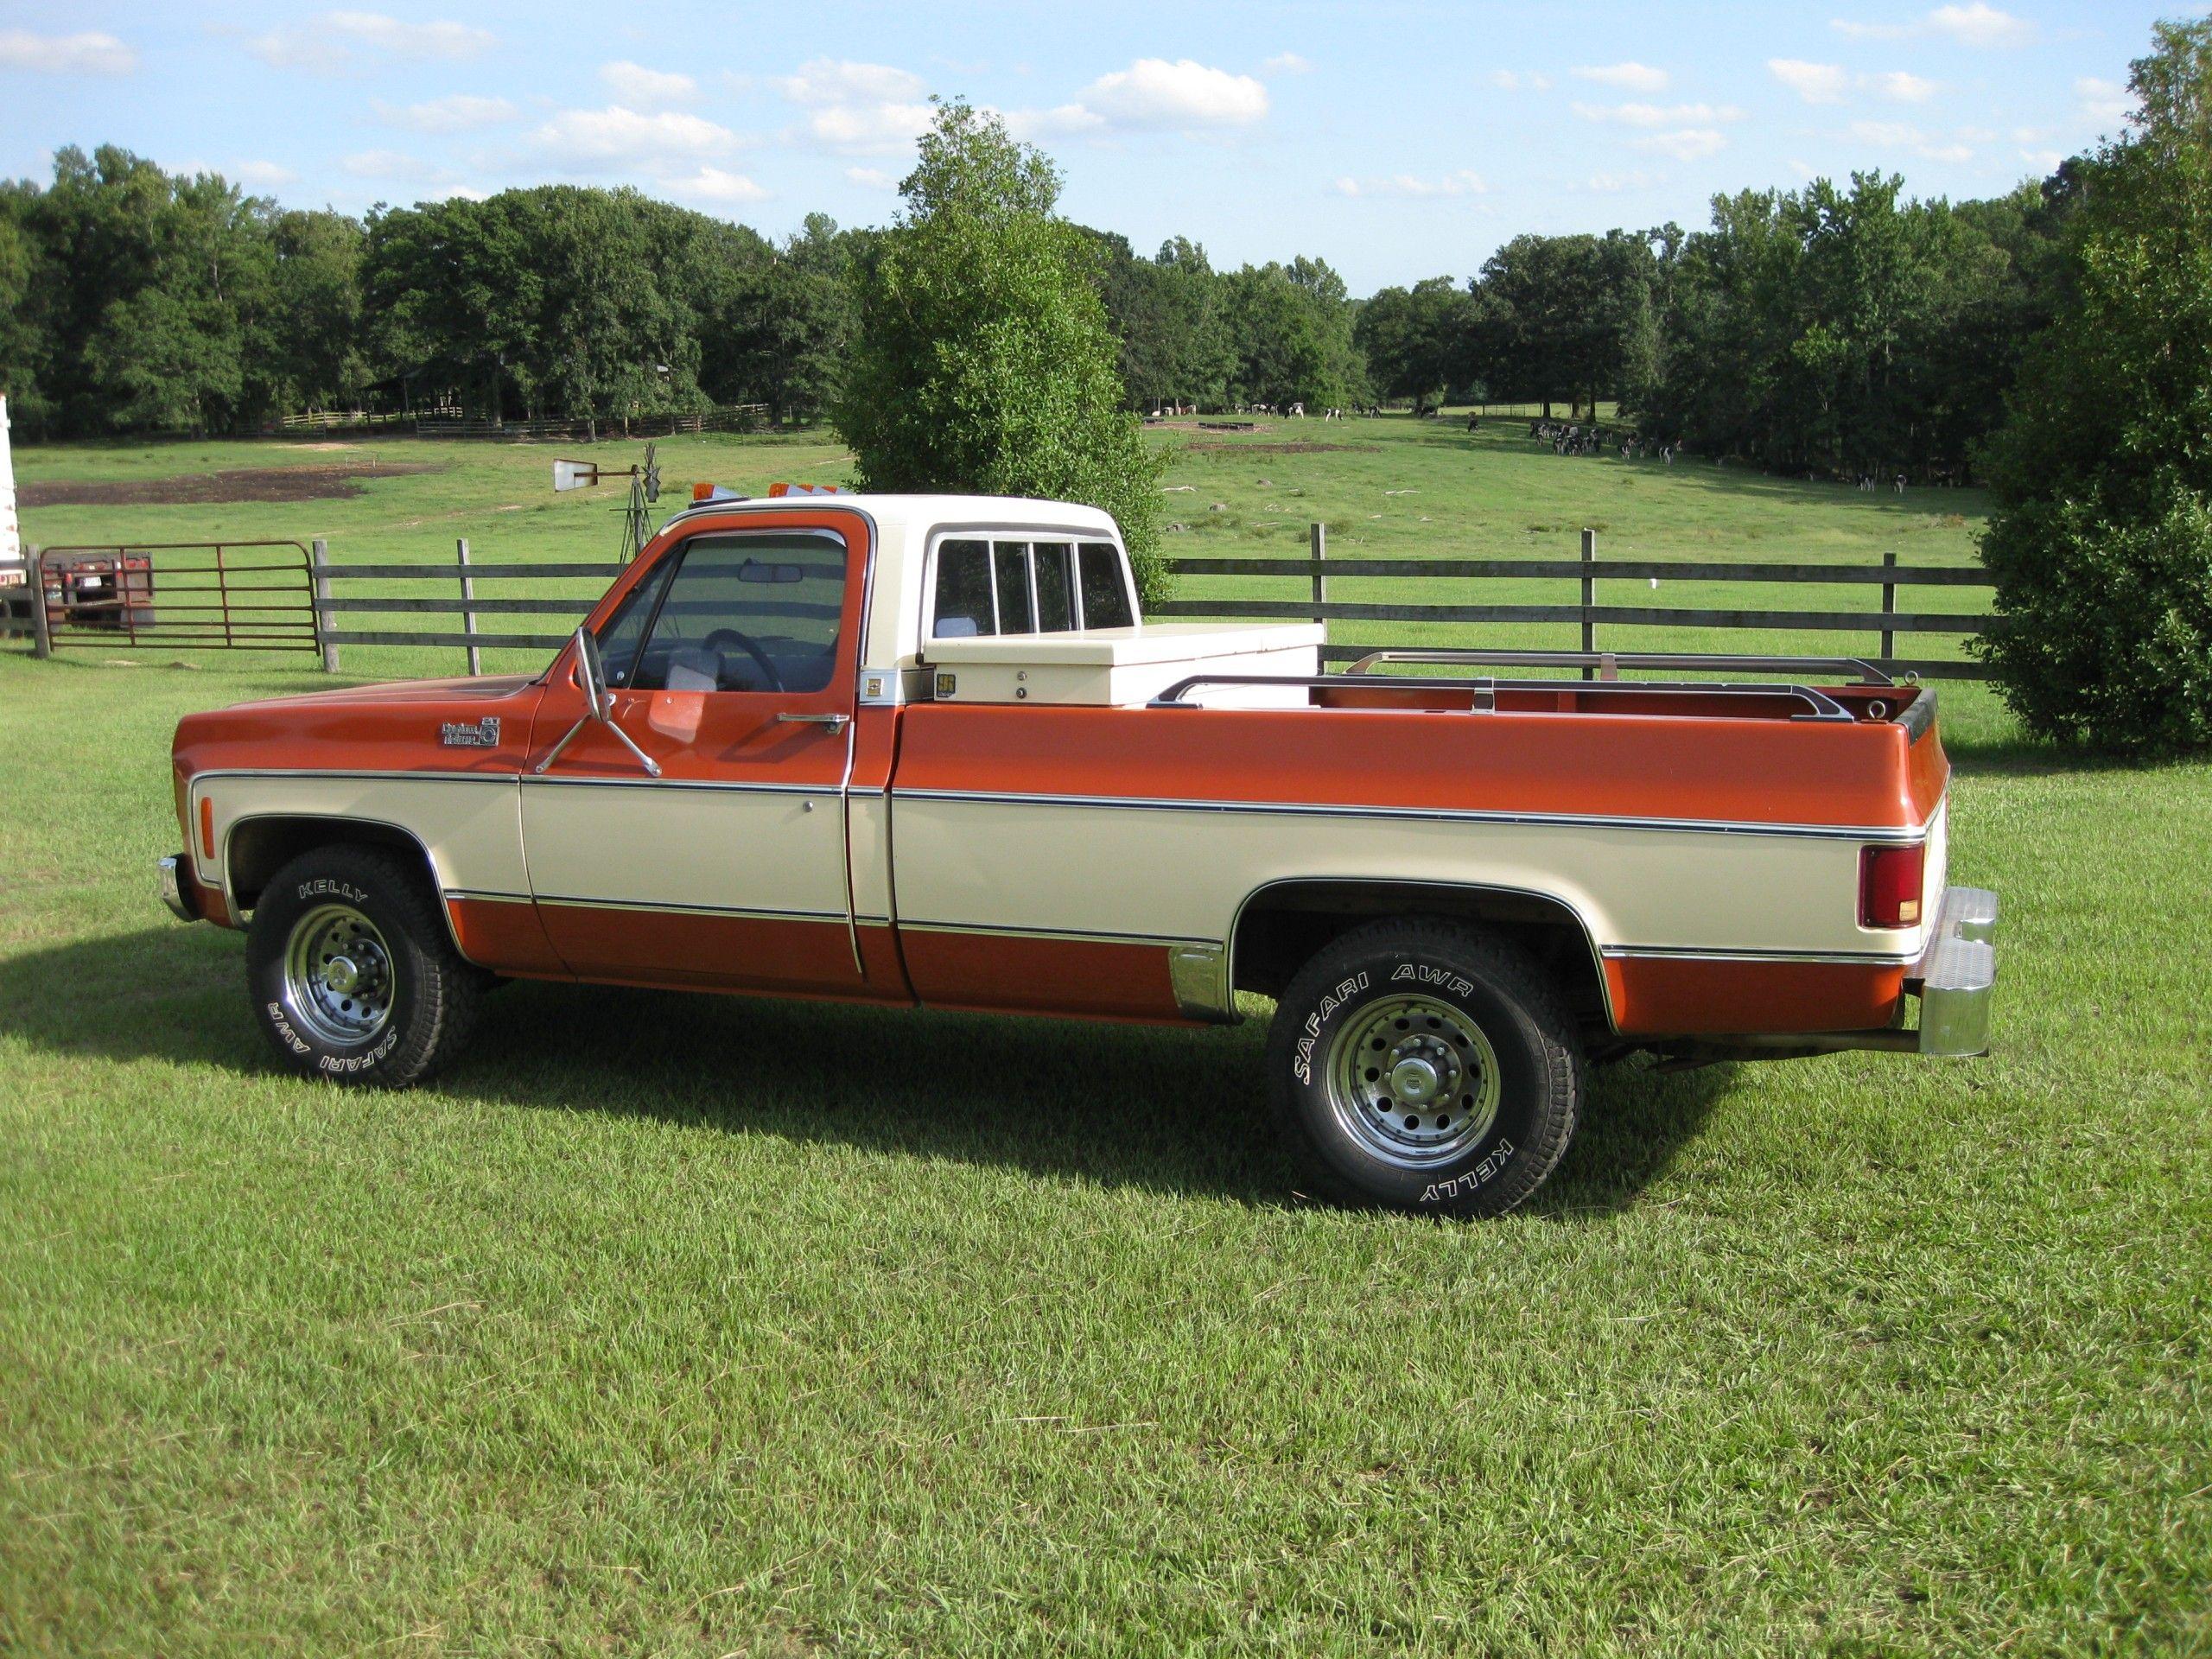 1976 Chevrolet Truck 1976 Chevy Truck Chevy Trucks 1976 Chevy